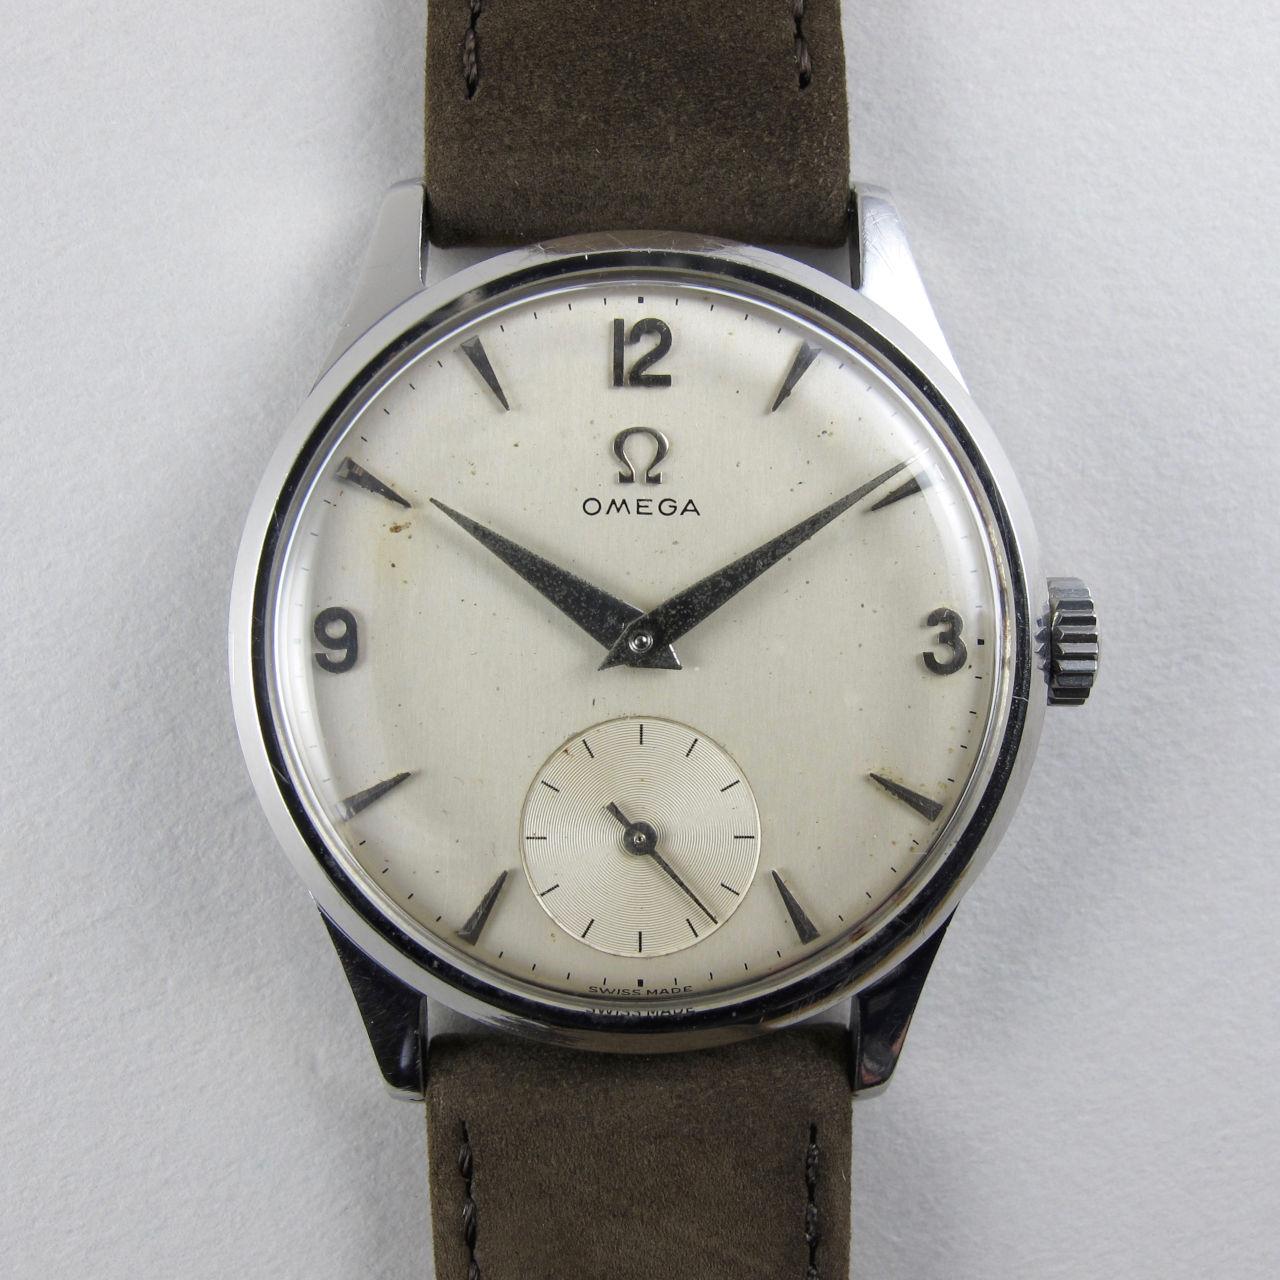 Omega Ref. 720 steel vintage wristwatch, circa 1952